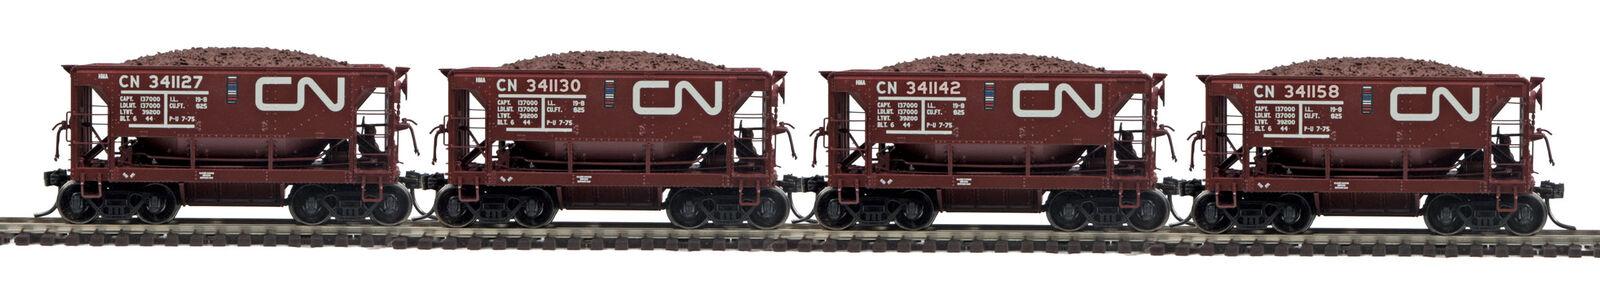 MTH HO Trains Canadian National 4 Car Center Discharge Ore Car Set 80-90084